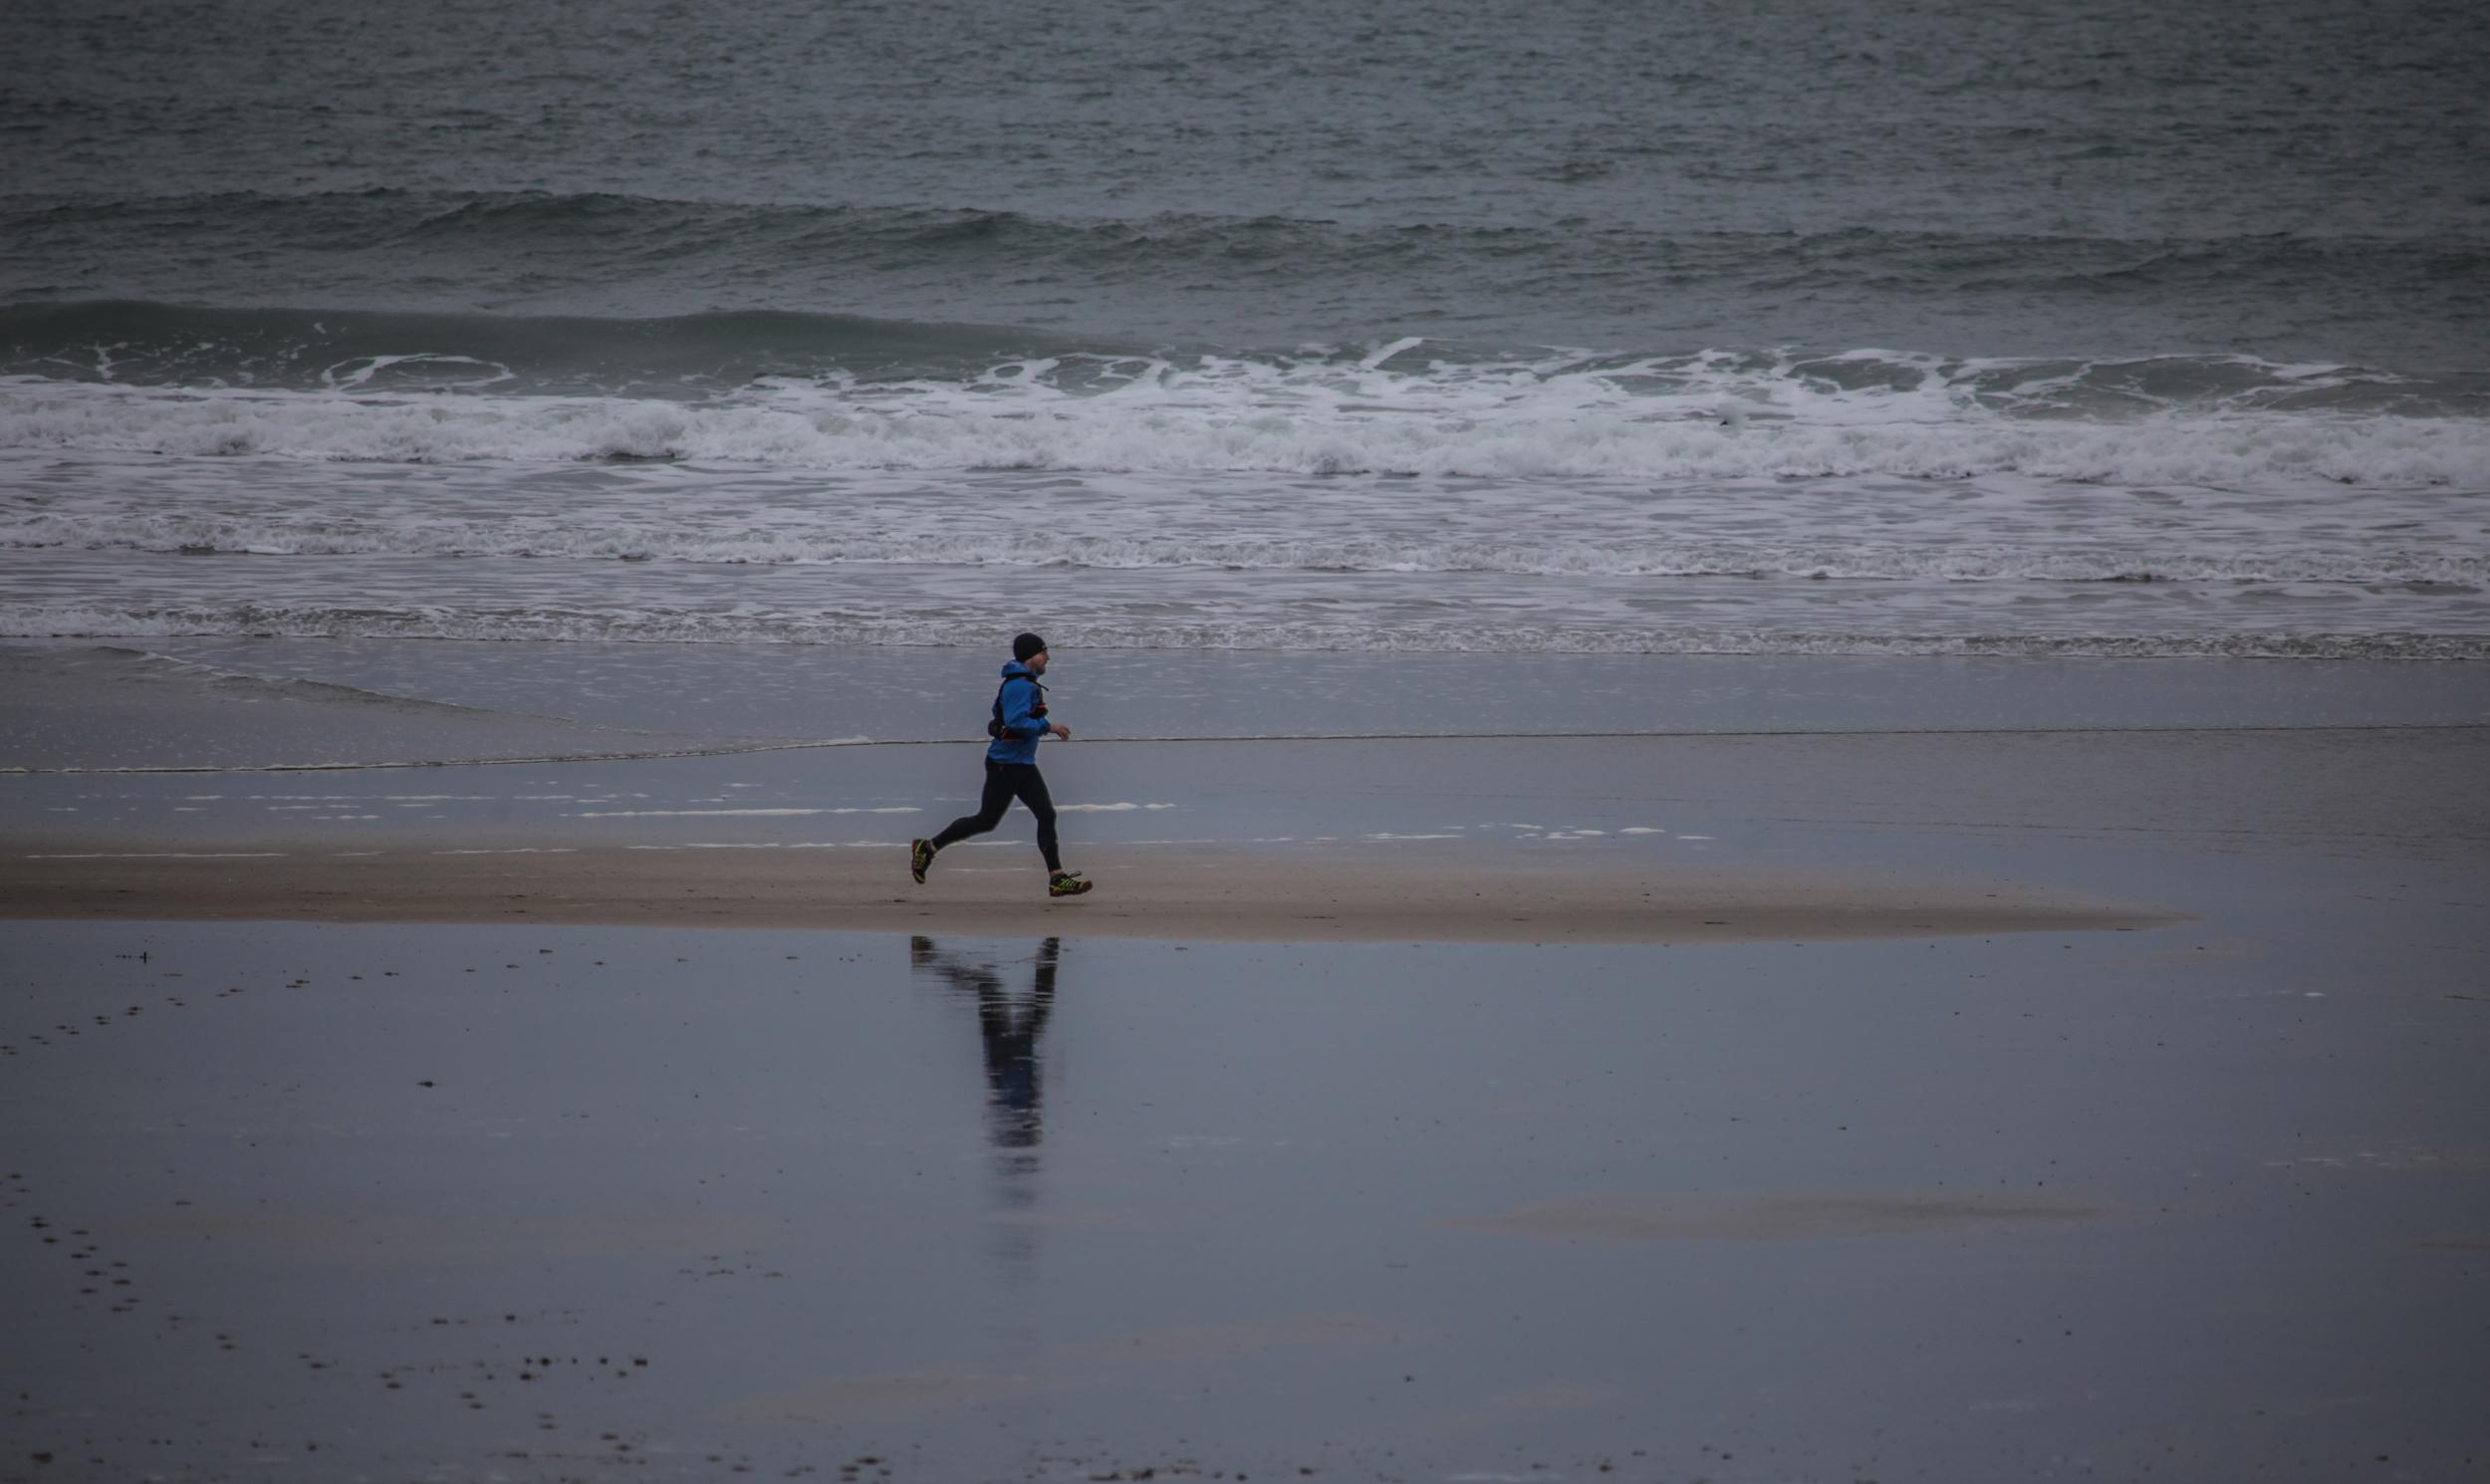 Great British MINI Adventure Day 10 - Trail Running the Pembrokeshire Coast, Whitesands Bay